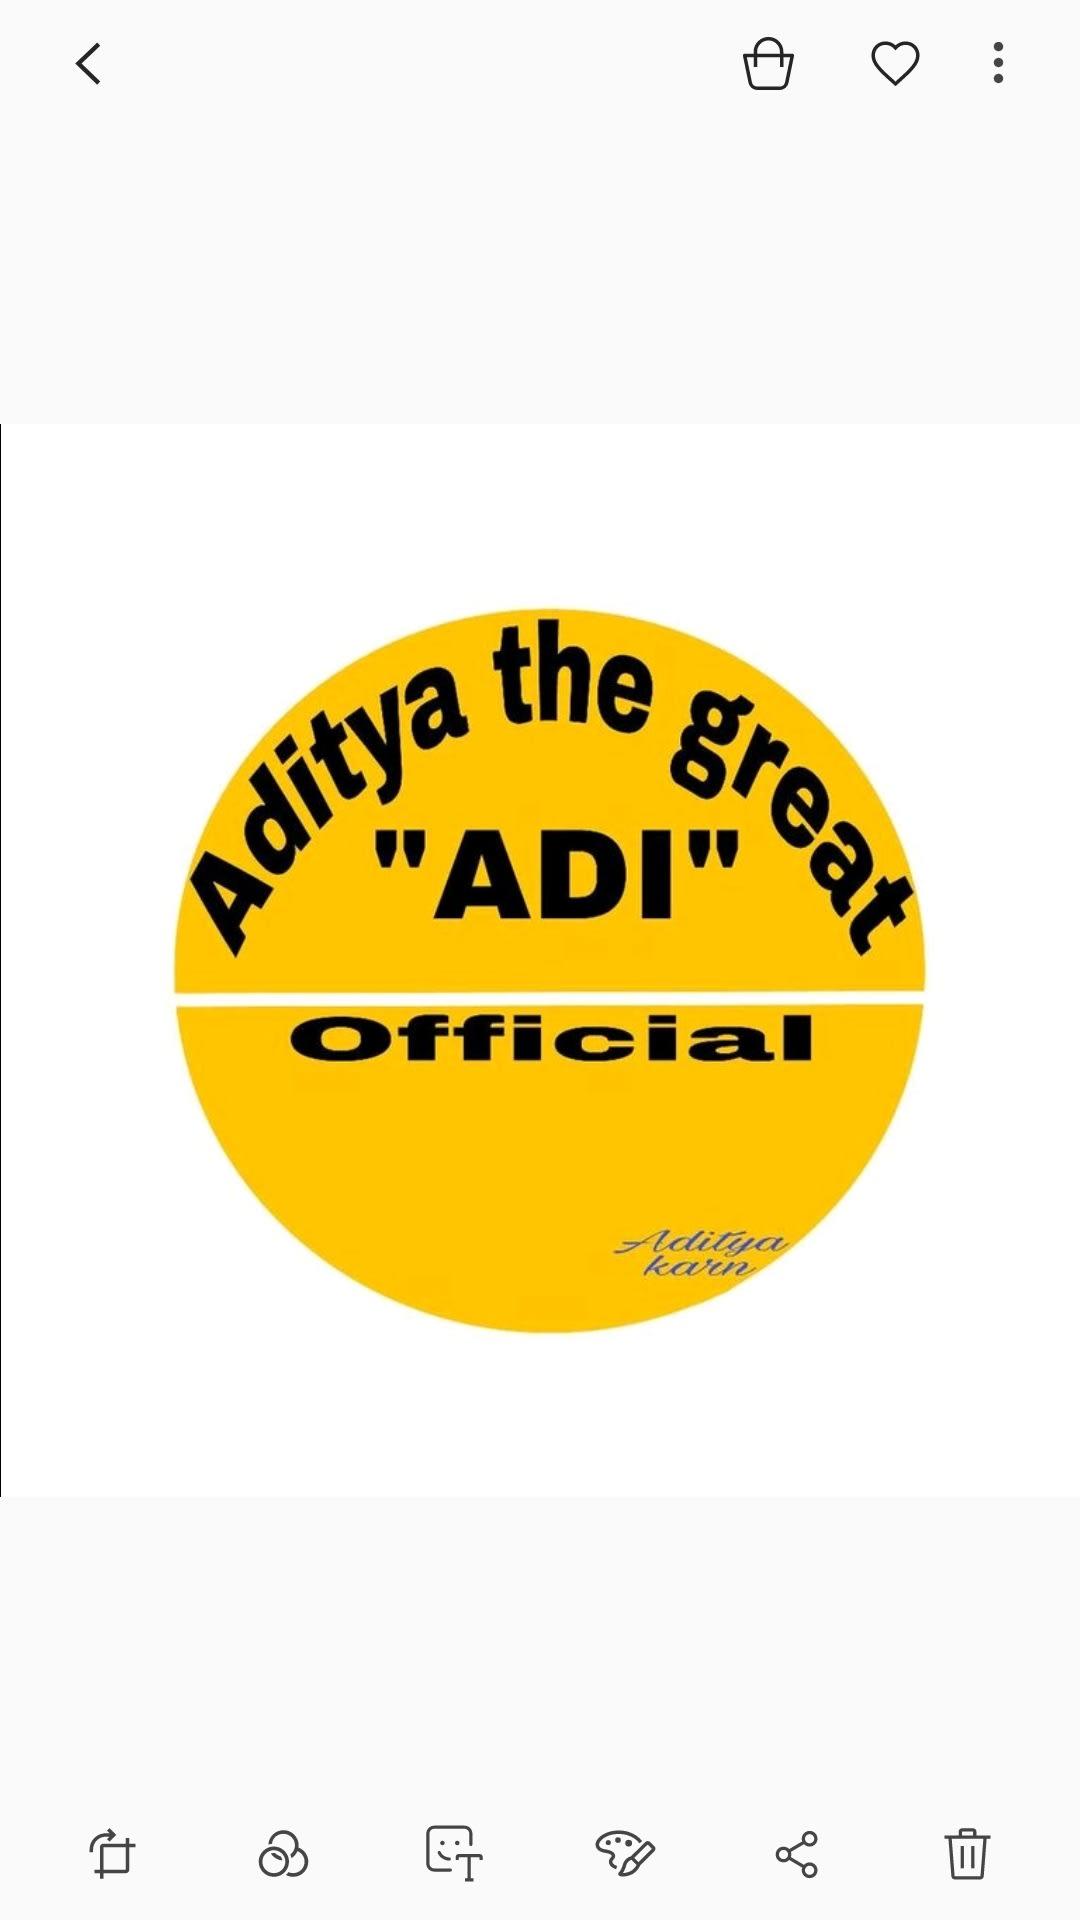 "Aditya the great ""ADI"""